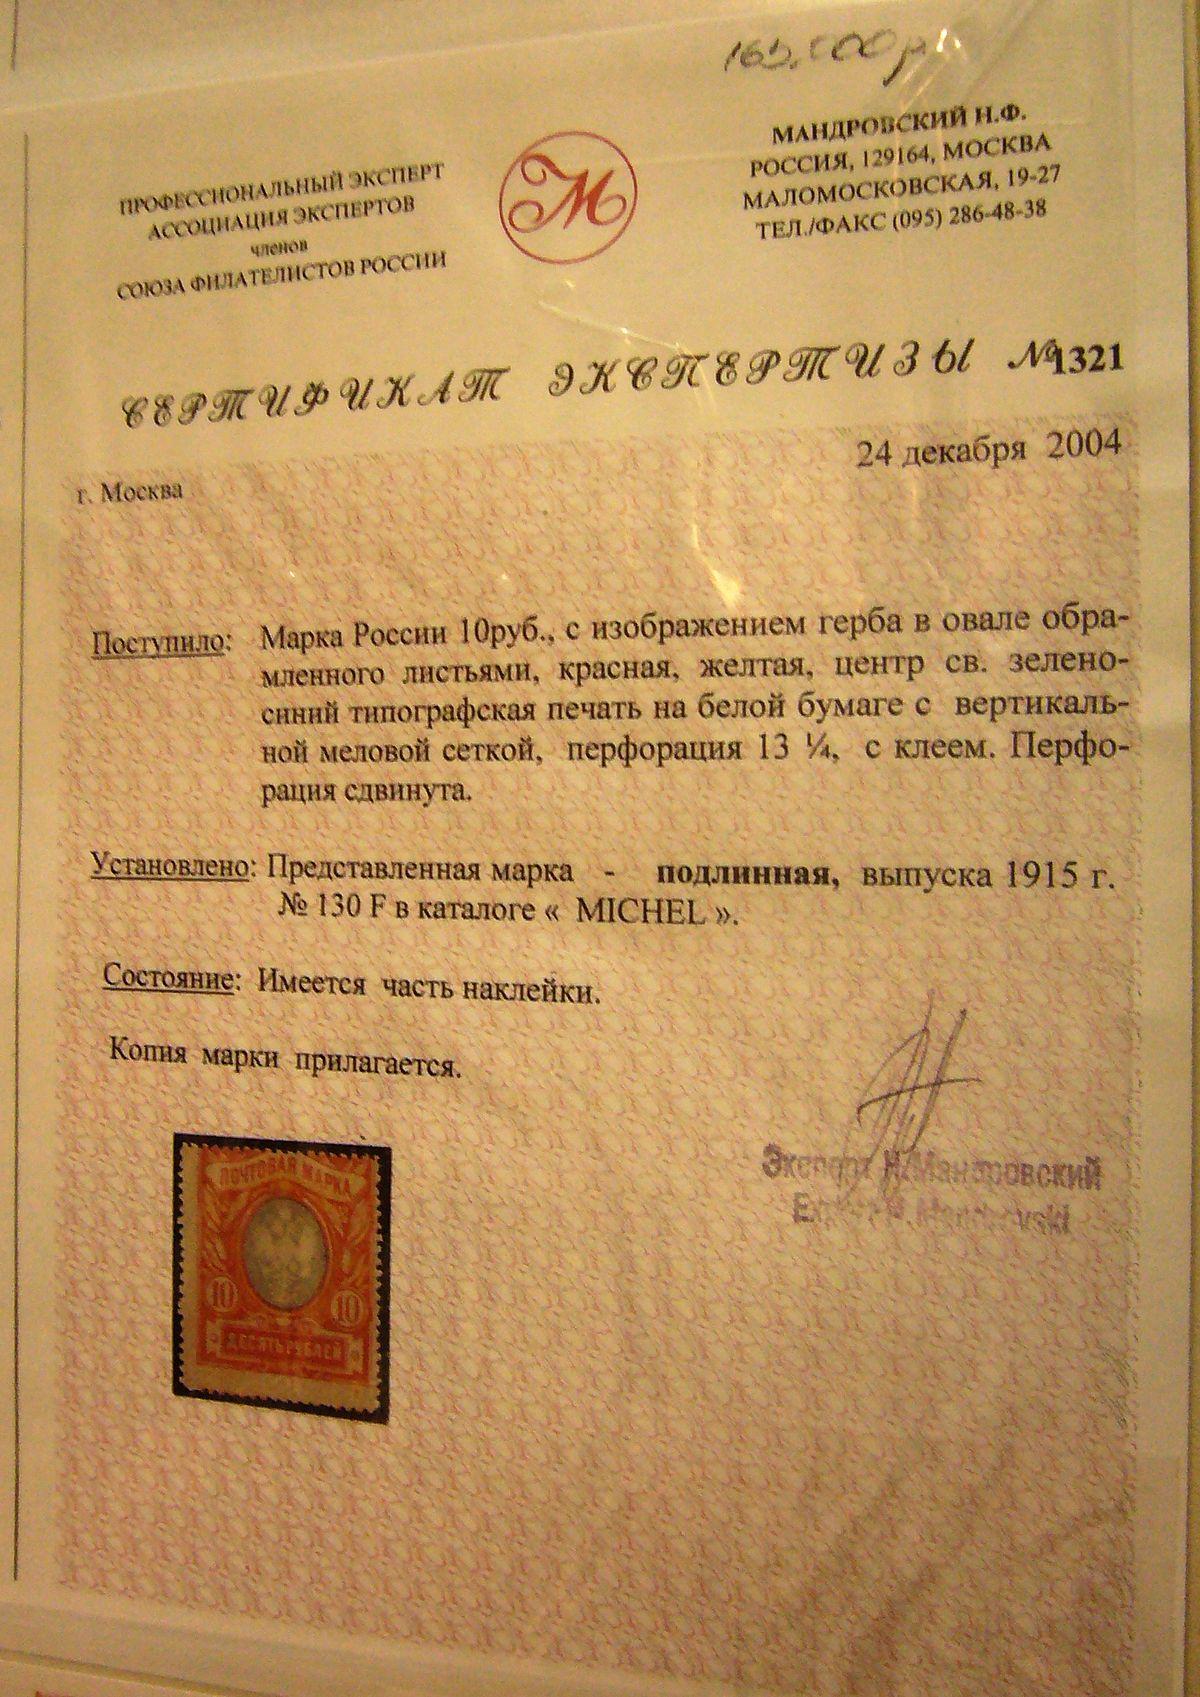 philatelic expertisation